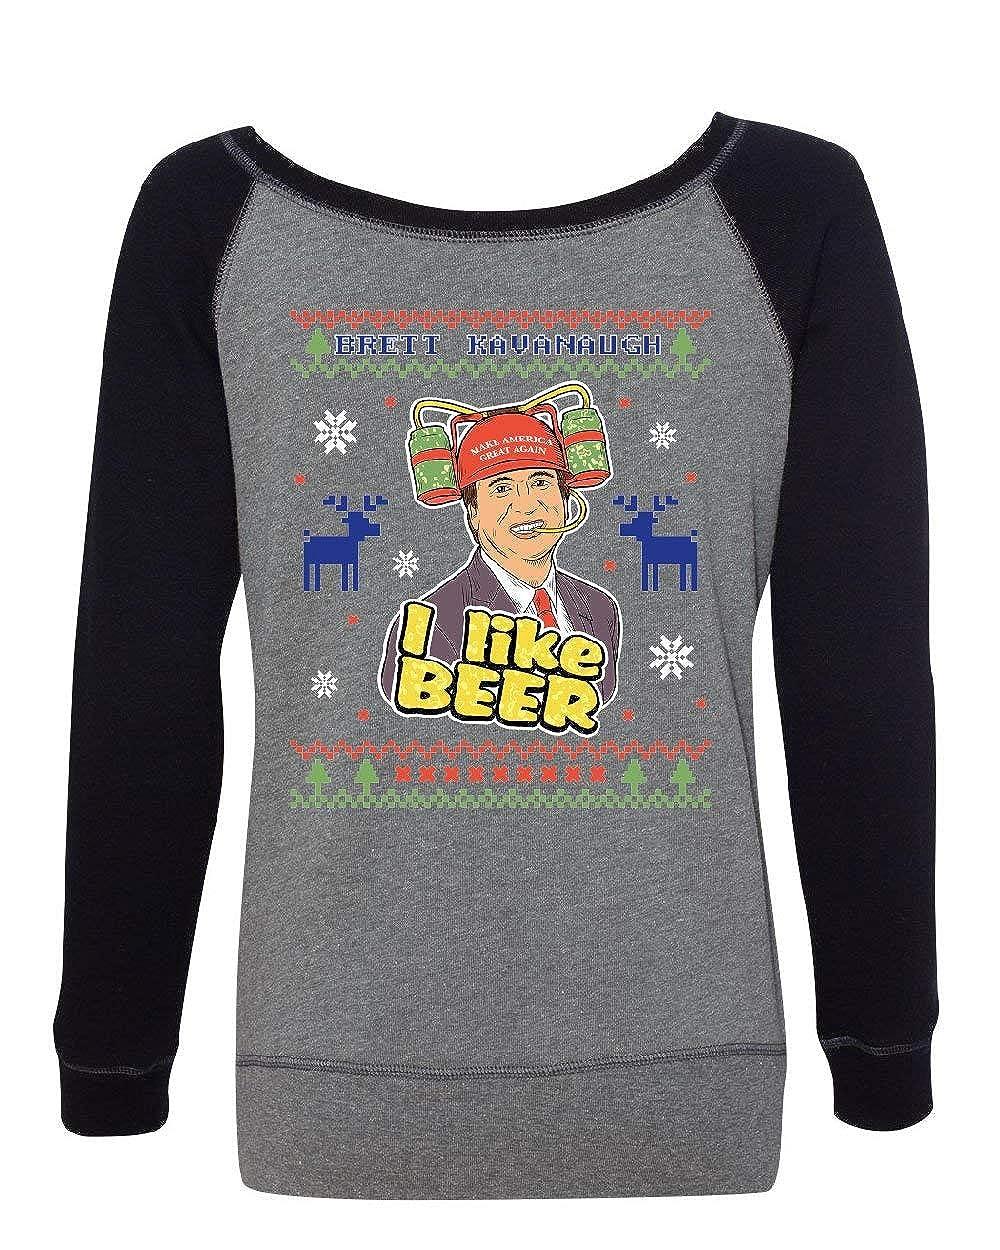 Tee Hunt Brett Kavanaugh Ugly Sweater Womens Sweatshirt I Like Beer Christmas Xmas